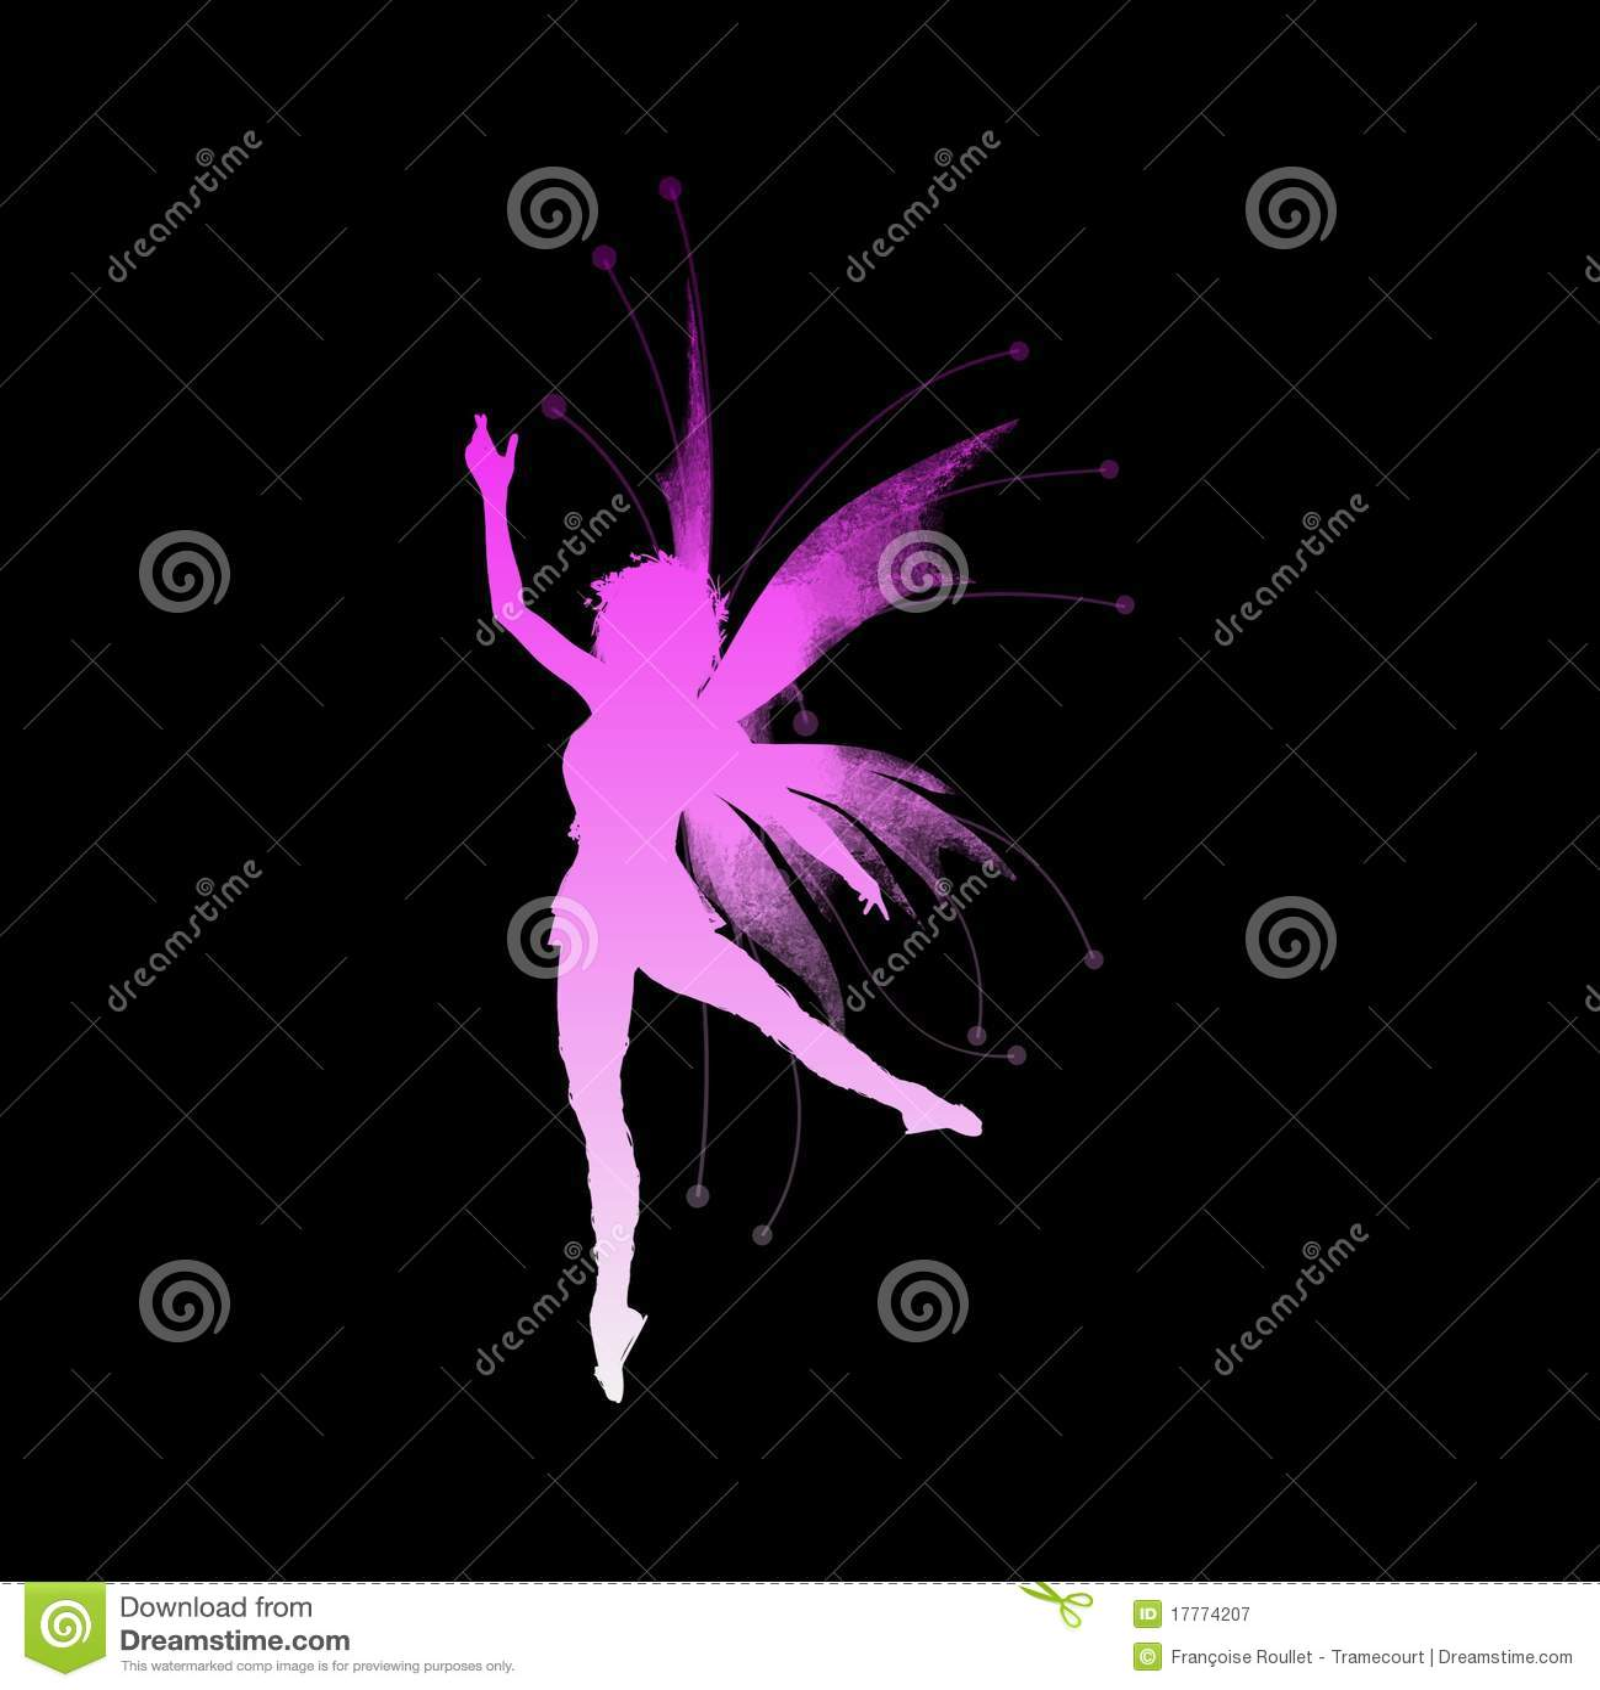 pink ribbon wallpaper free